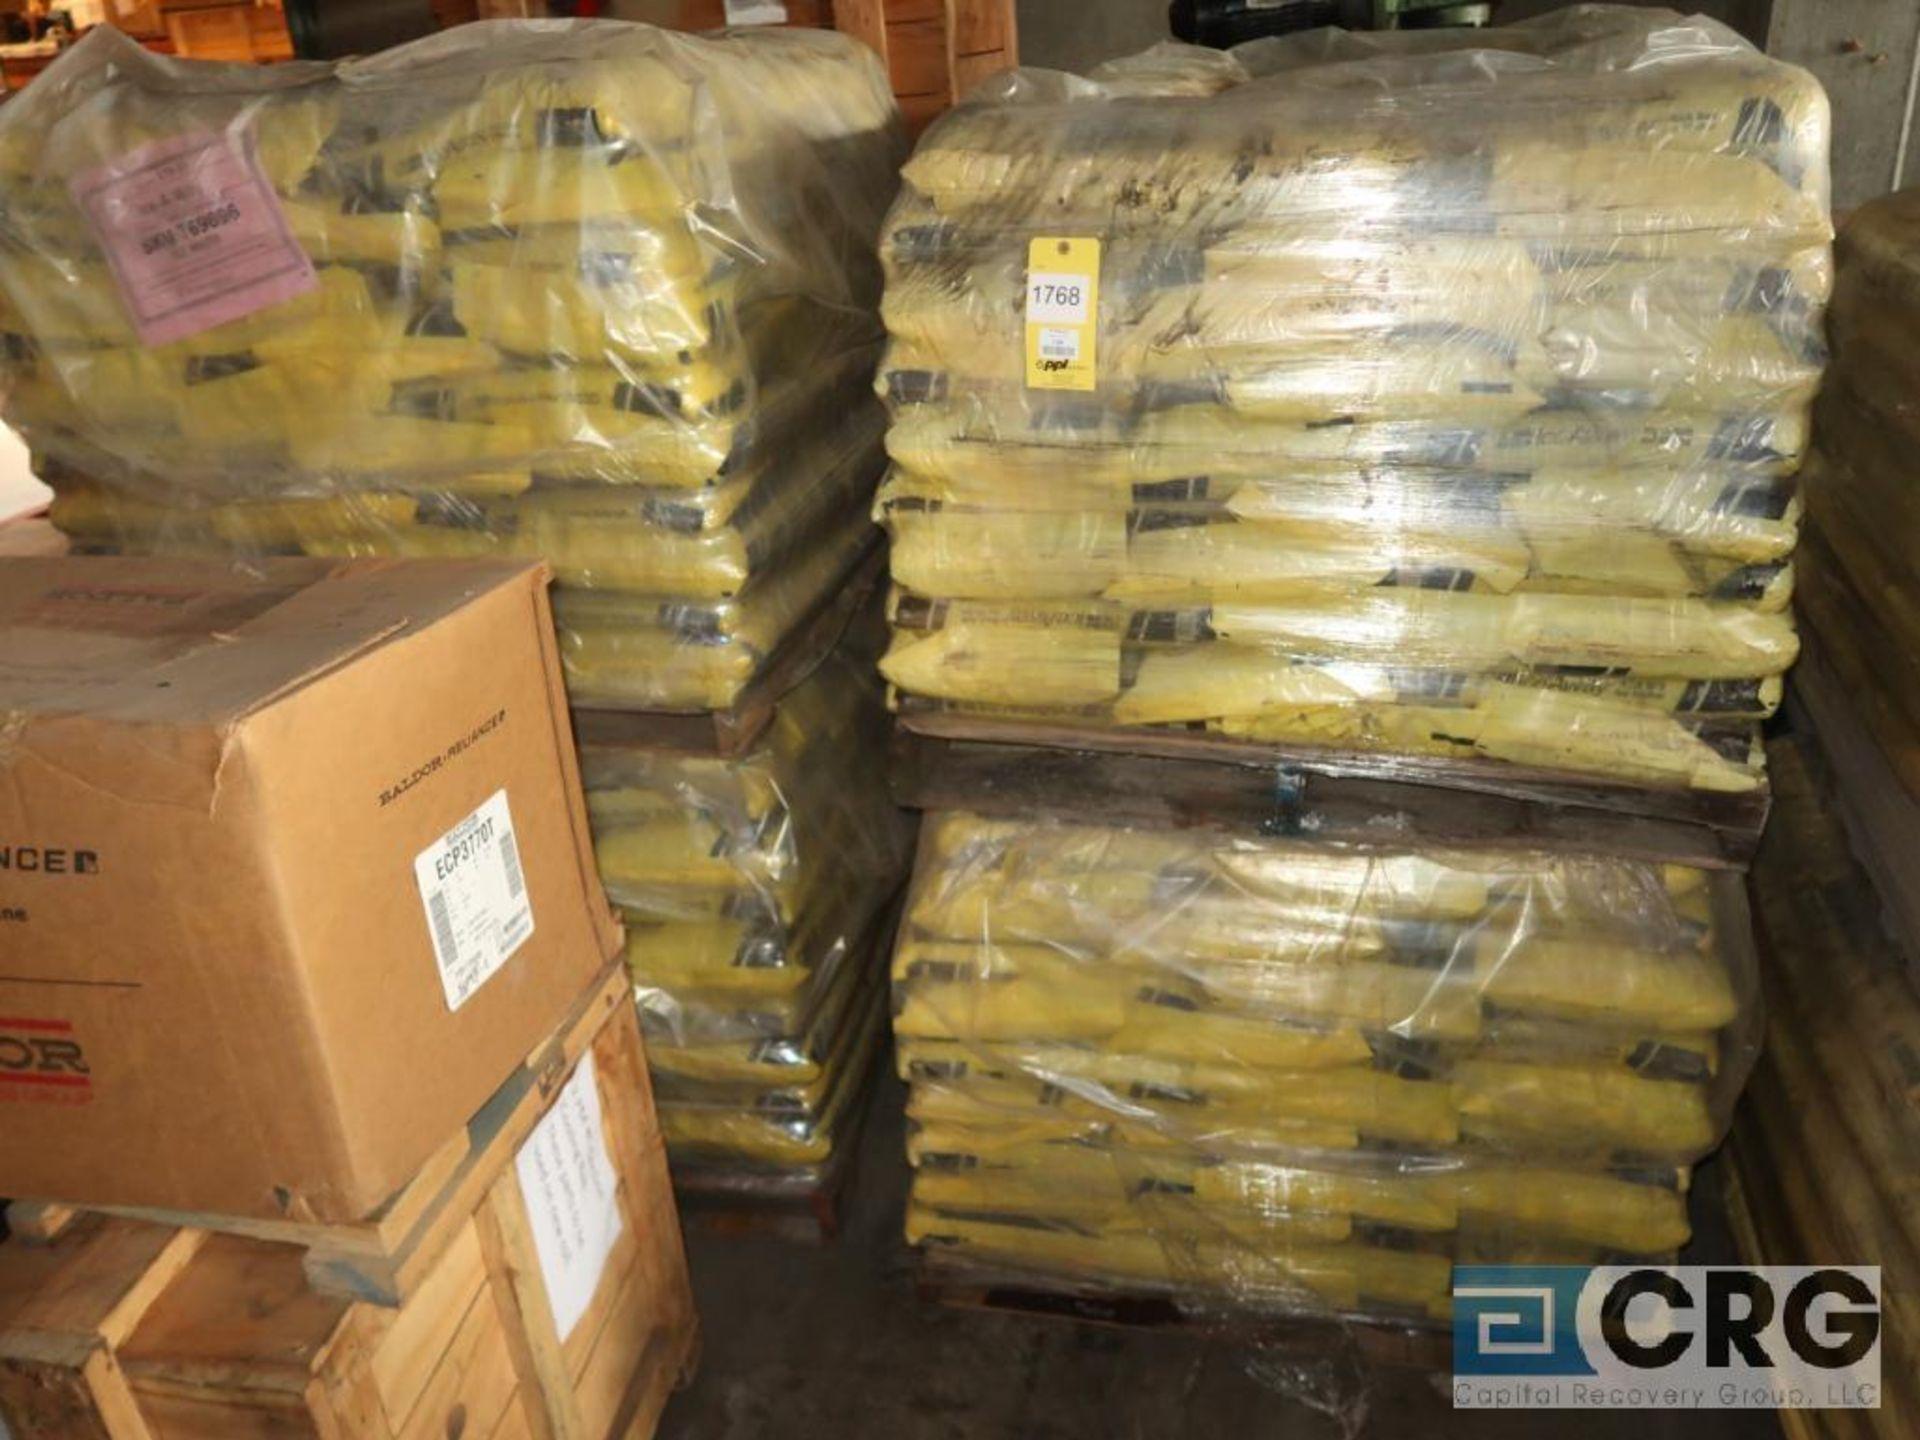 Lot of (10) pallets Ice Away rock salt, 100 bags per pallet, 25 lb. per bag (Next Bay) - Image 2 of 2